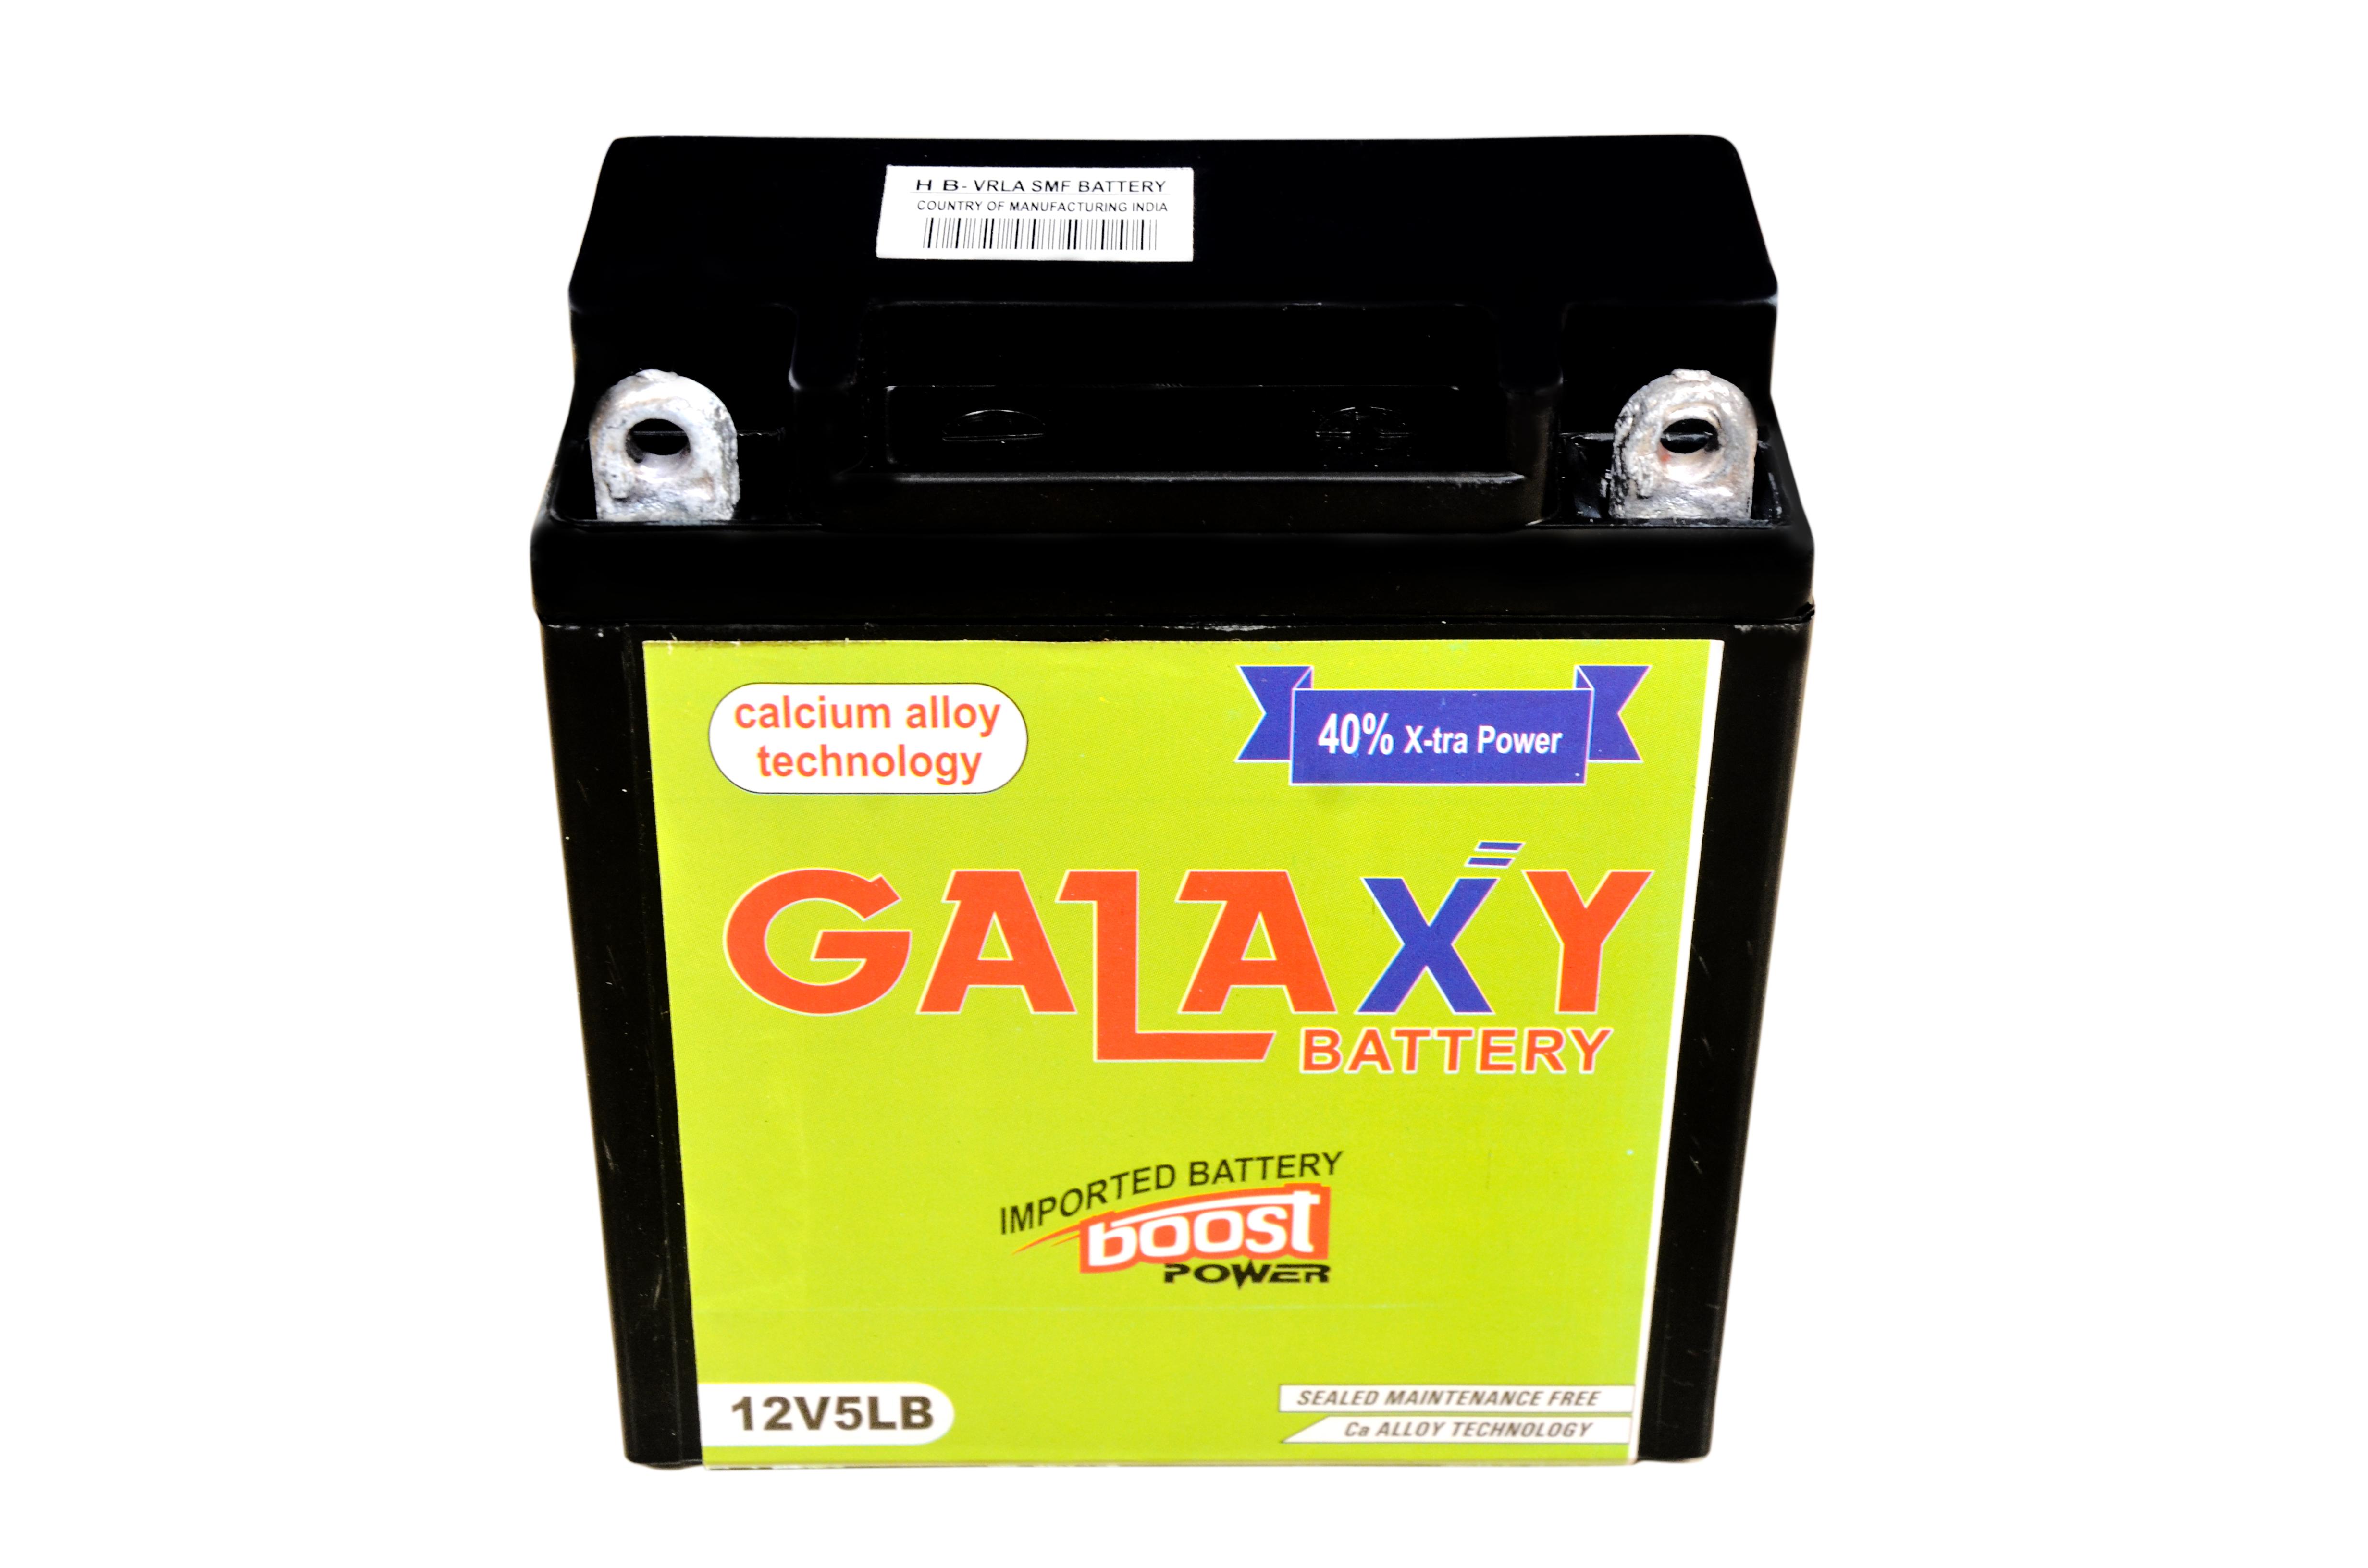 GALAXY 5LB BATTERY